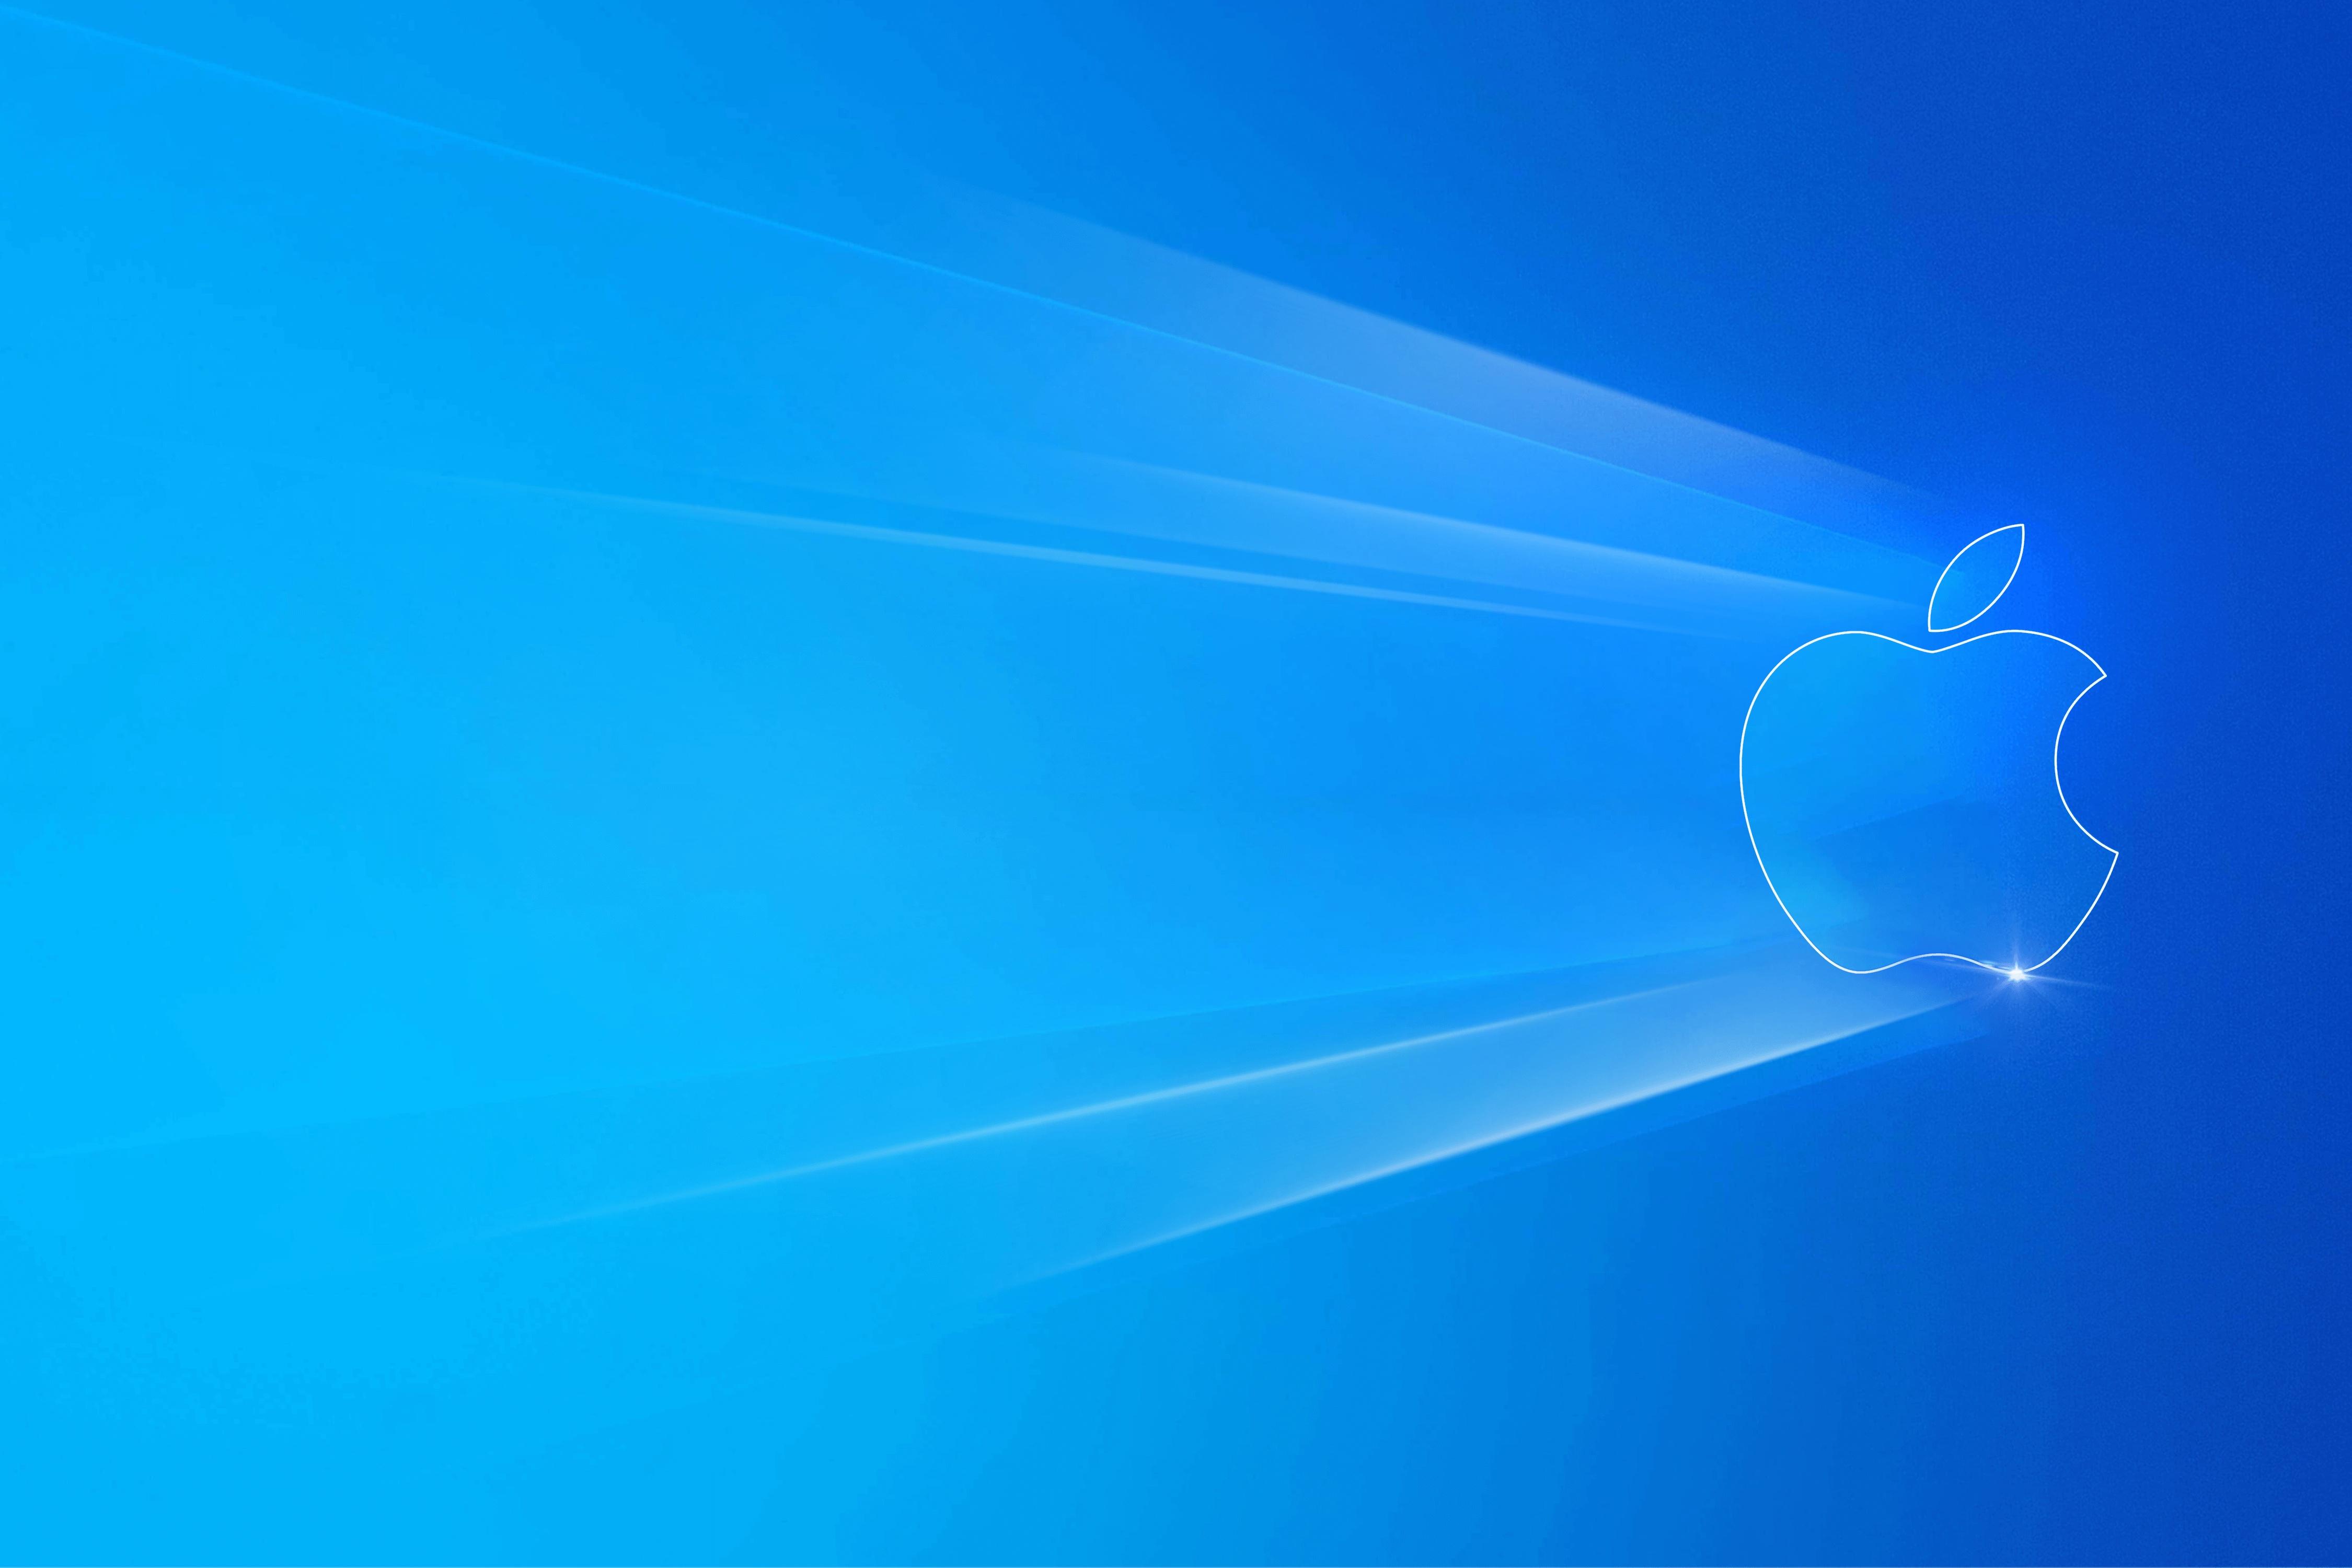 Windows 10 Light Apple cool background